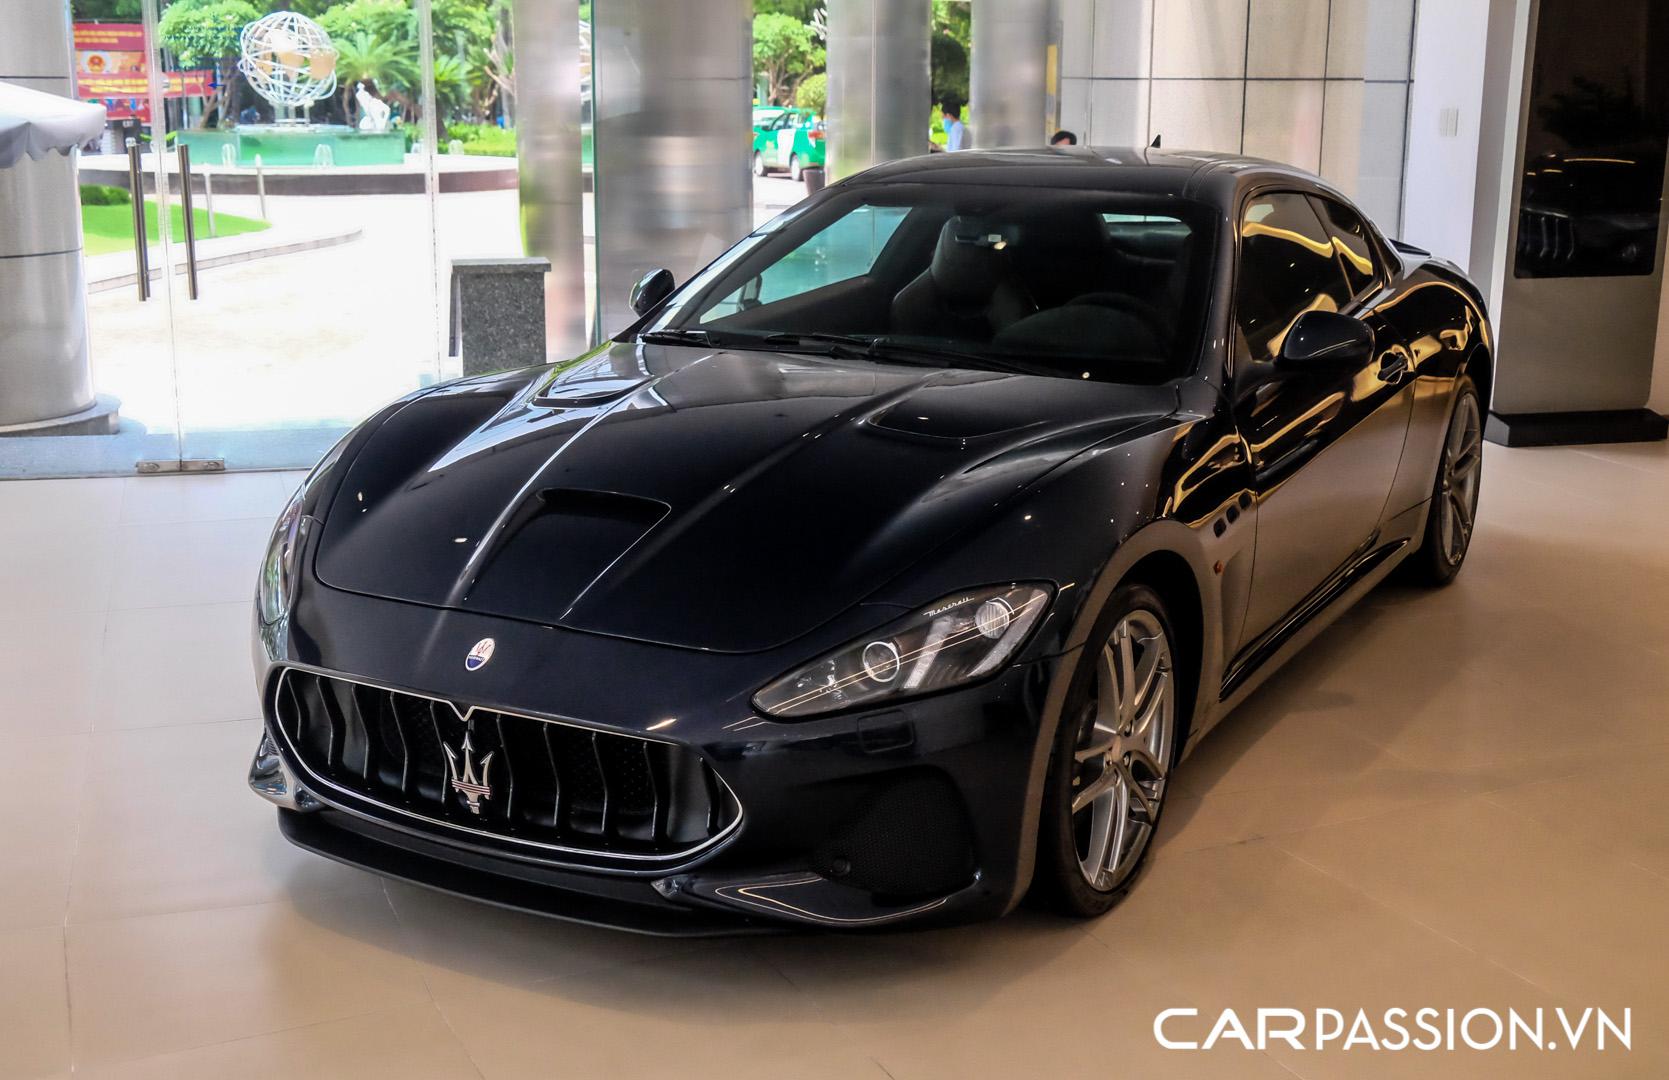 CP- Maserati GranTurismo Sport facelift1.JPG